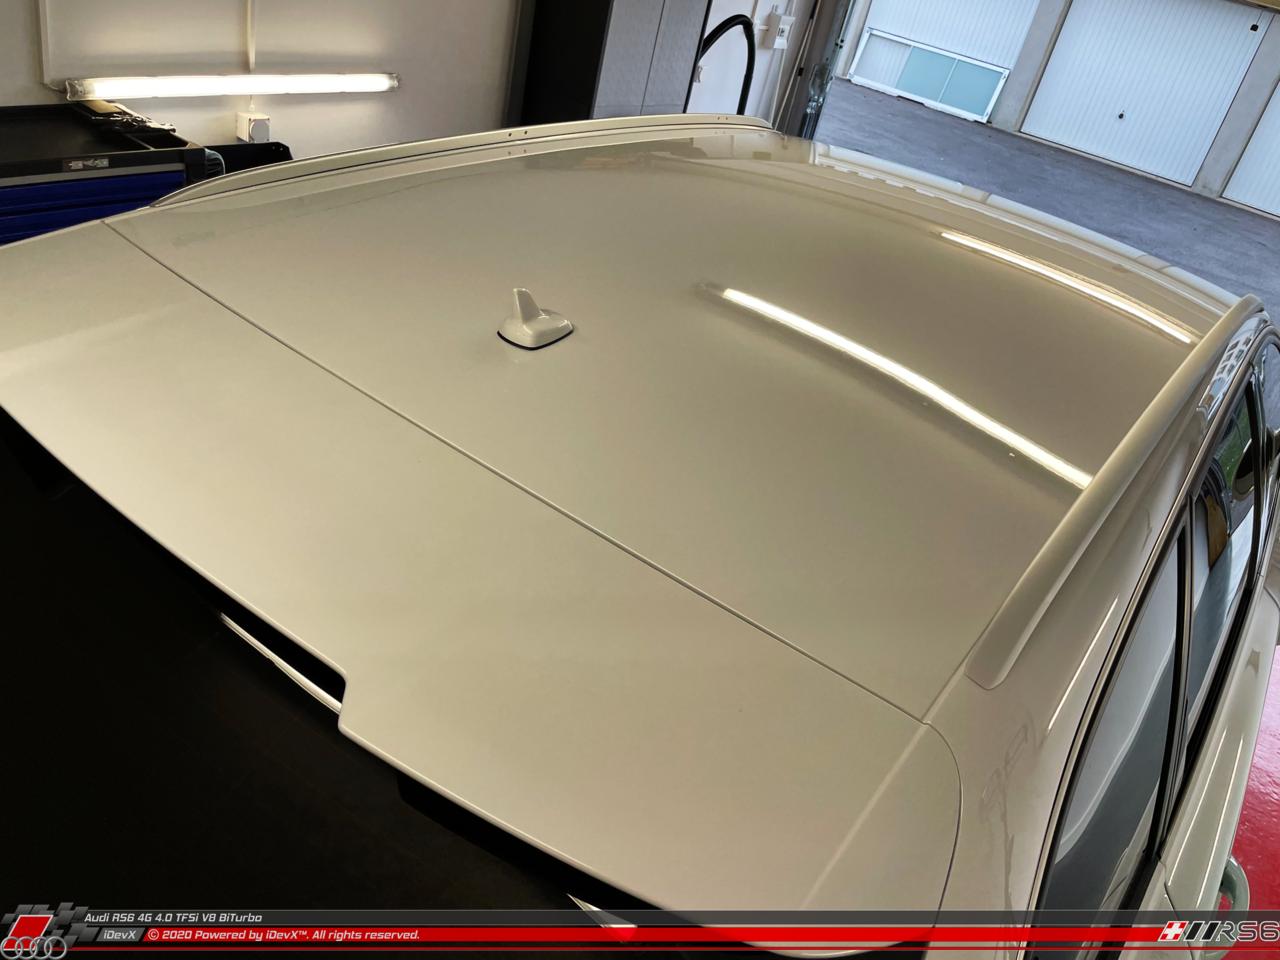 19.02.2021_Audi-RS6_iDevX_012.png